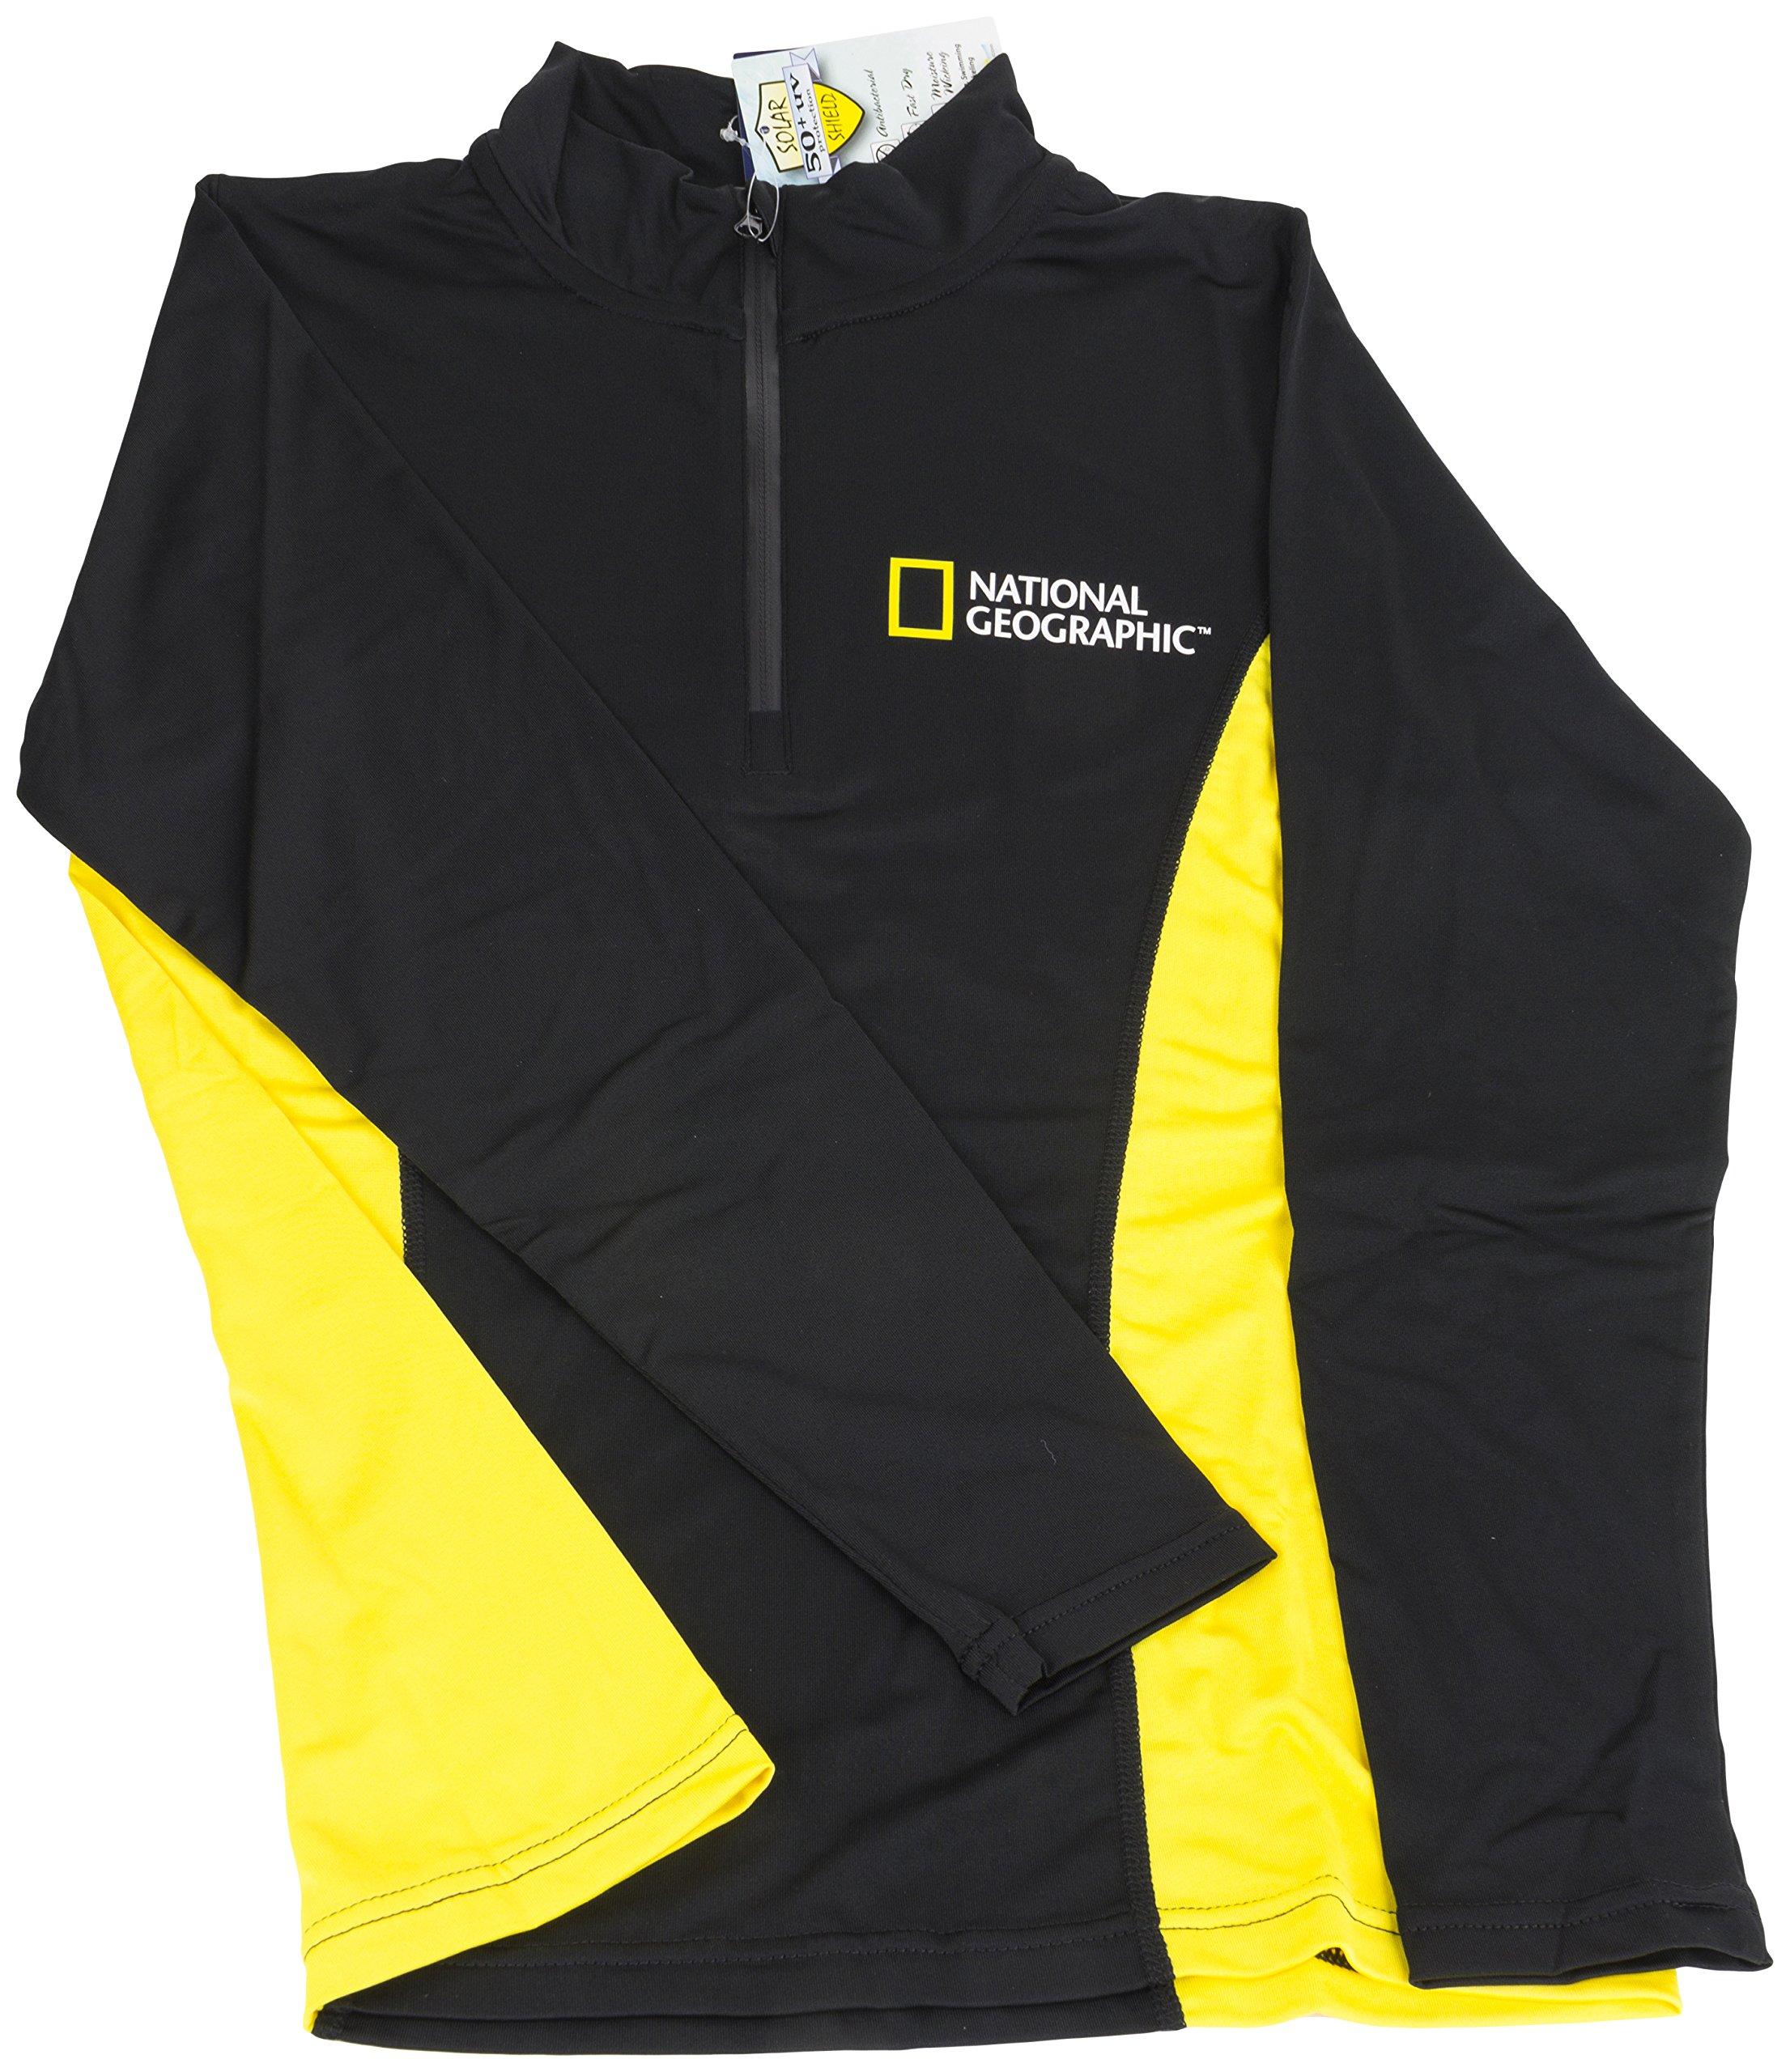 National Geographic Snorkeler 6283 Long Sleeve Rash Ladies Classic Black/Yellow Medium, Black